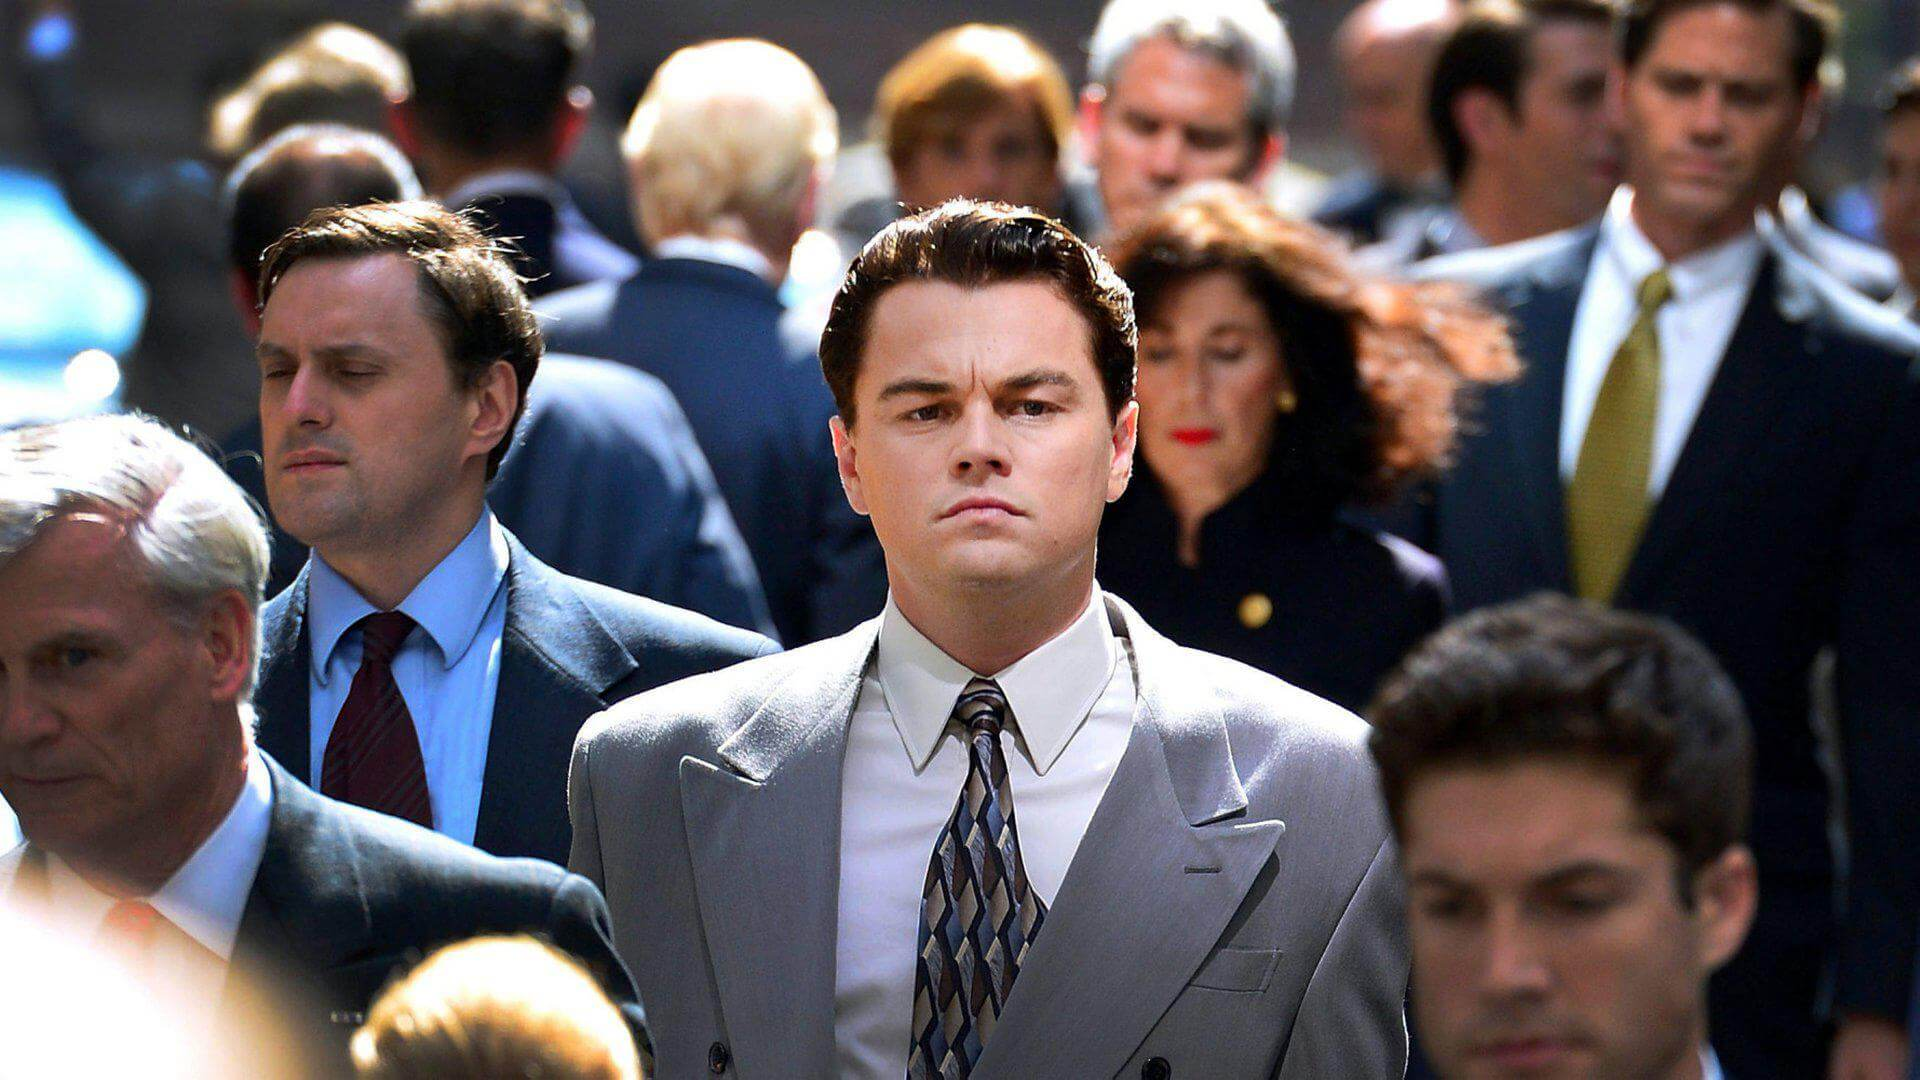 Regarder-Le-Loup-de-Wall-Street-sur-Netflix